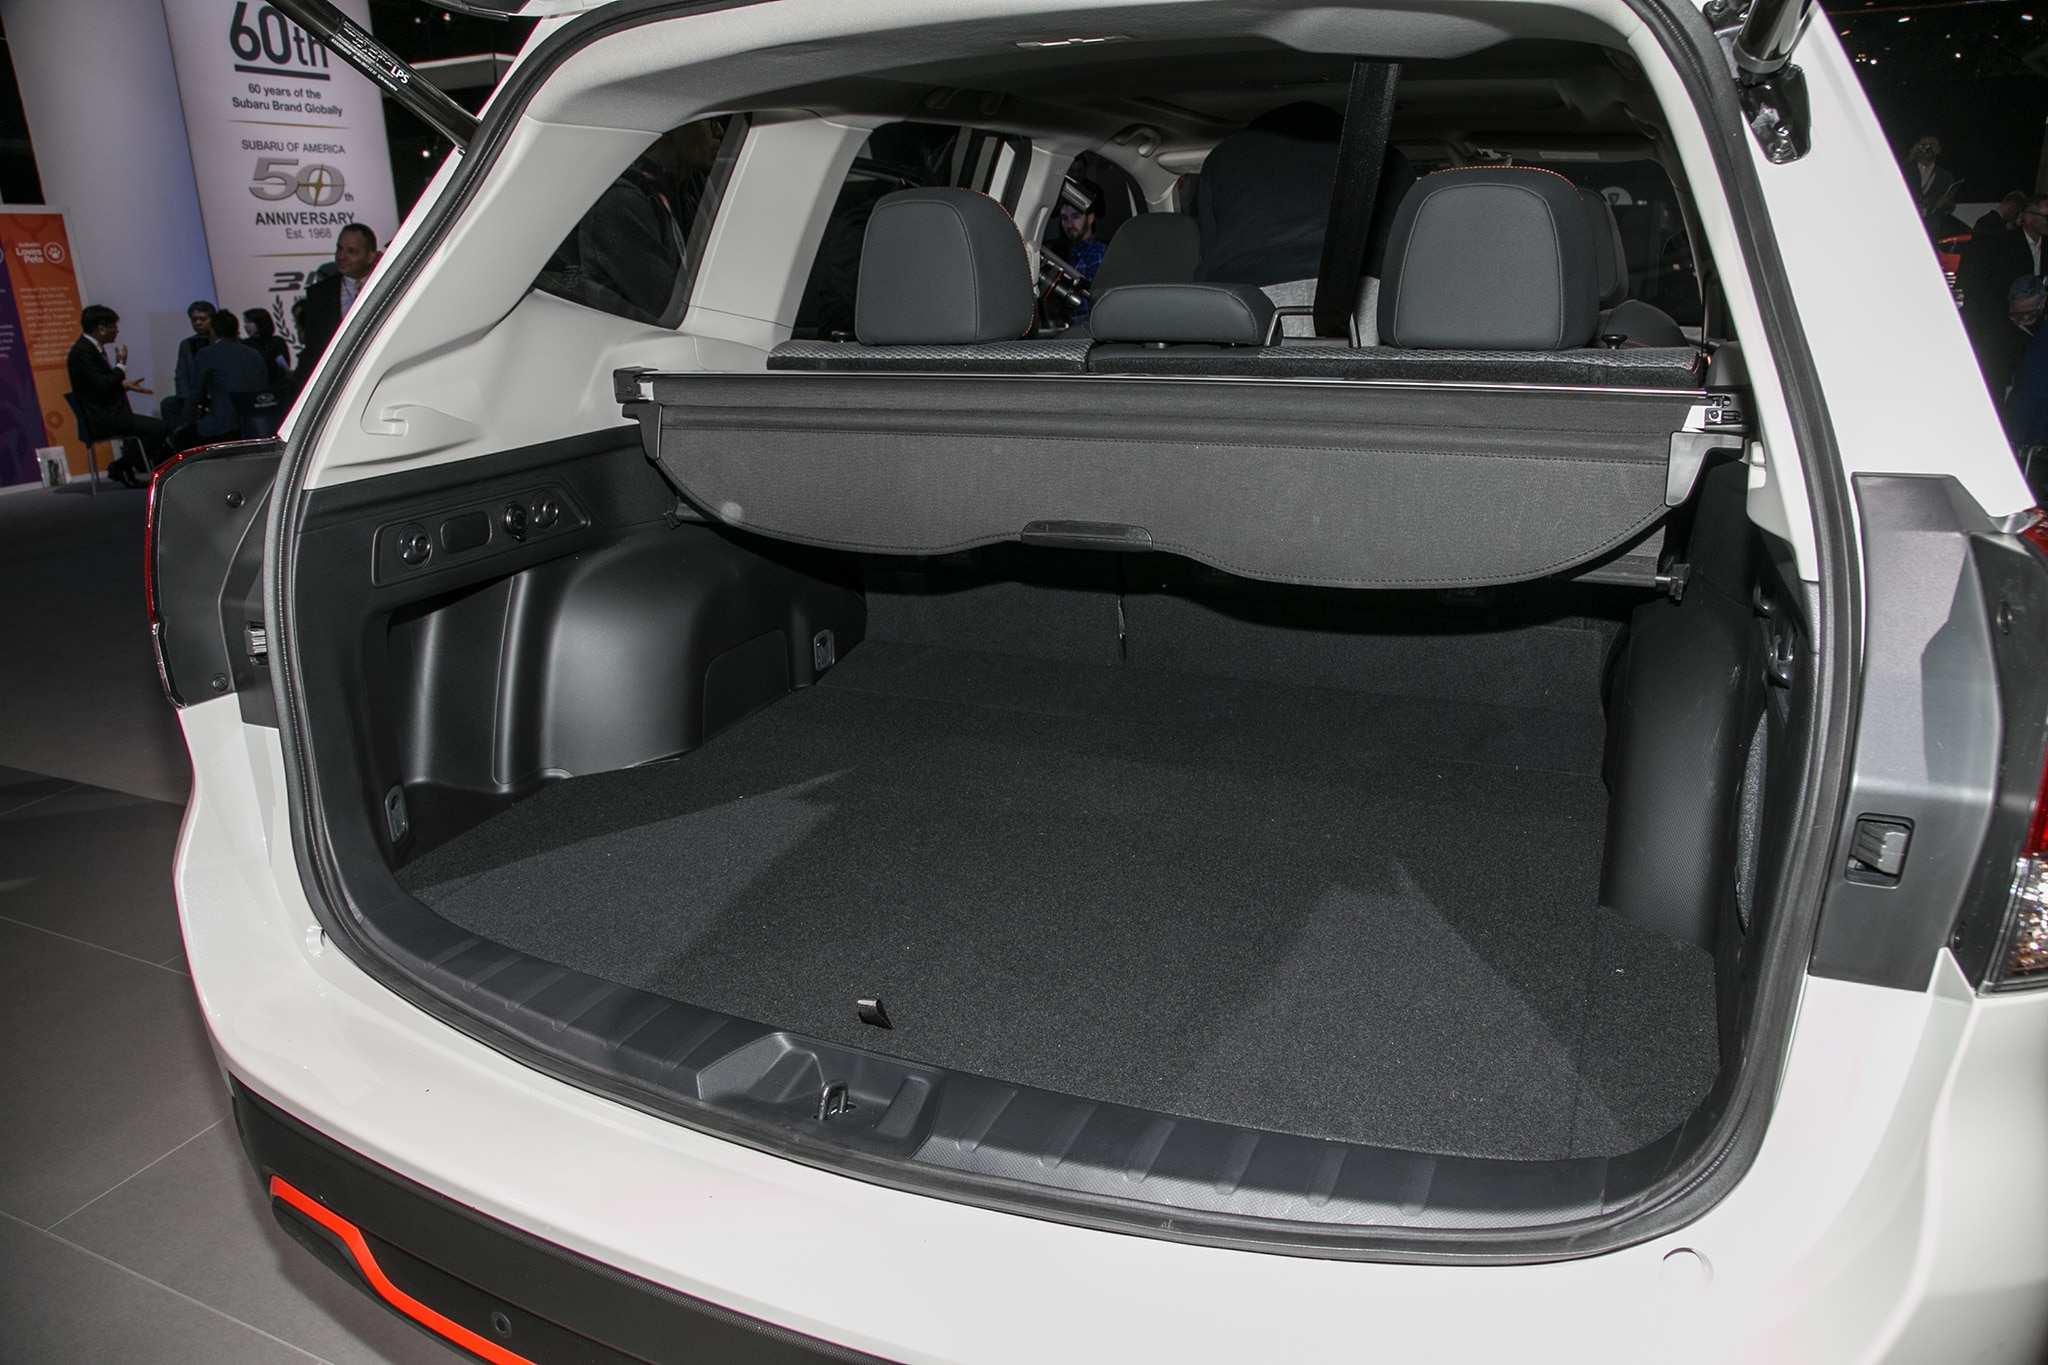 28 The The Subaru 2019 Forester Specs Interior Redesign and Concept by The Subaru 2019 Forester Specs Interior